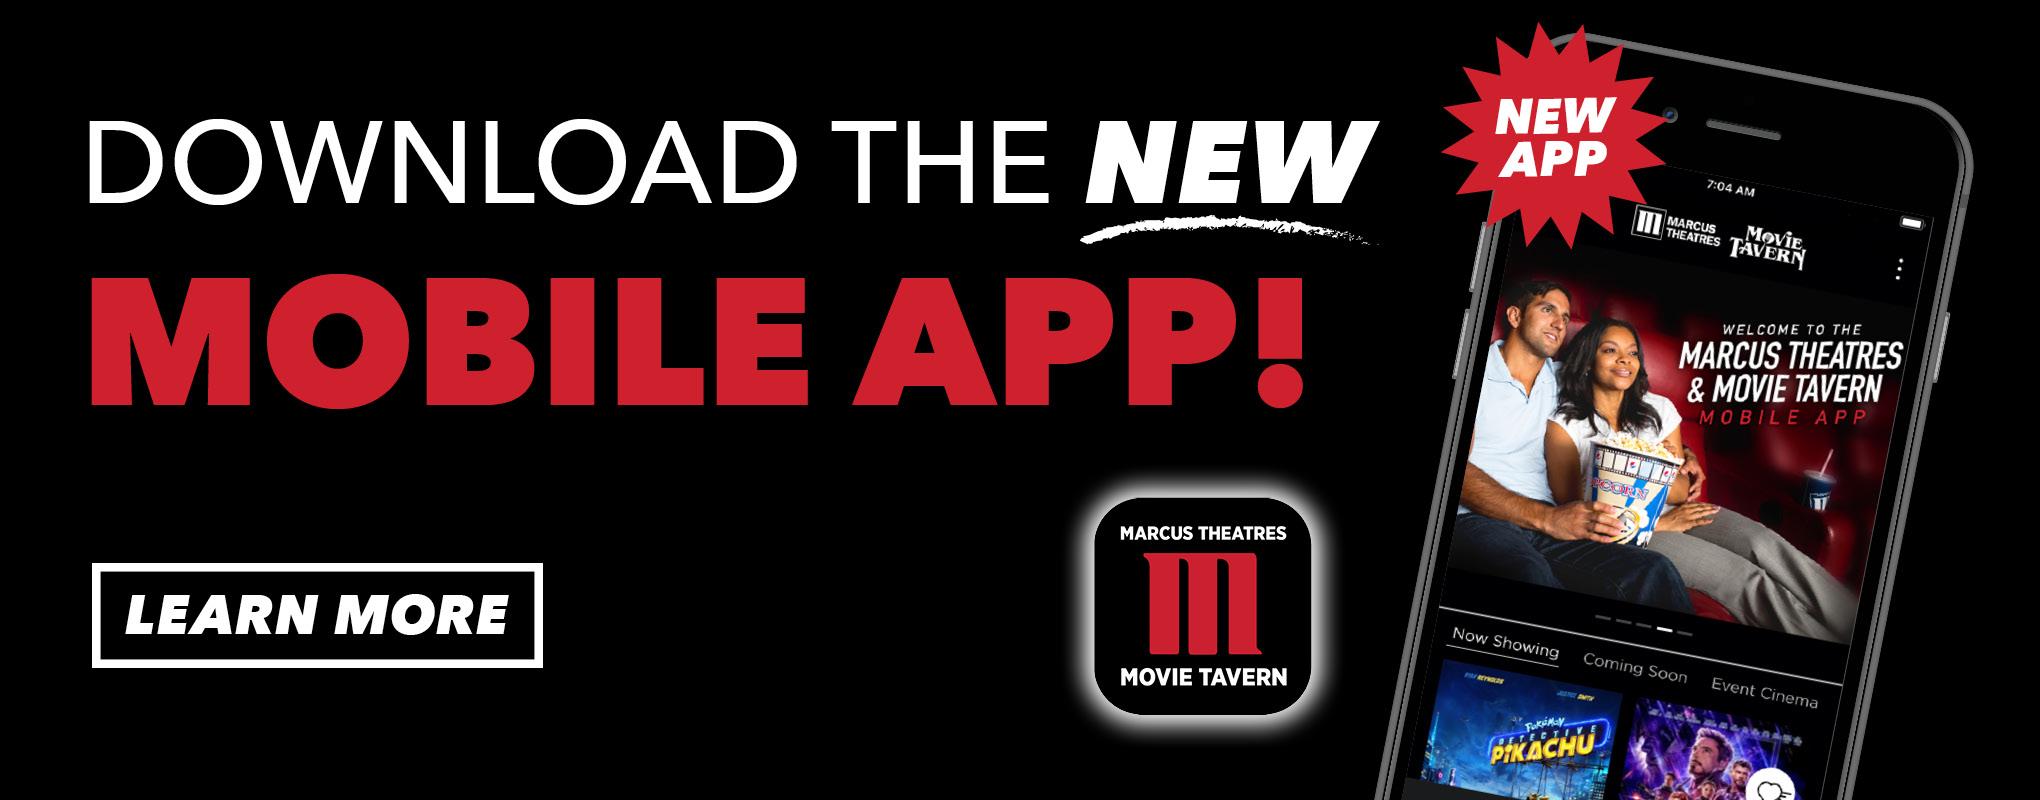 New Marcus Theatres Mobile App